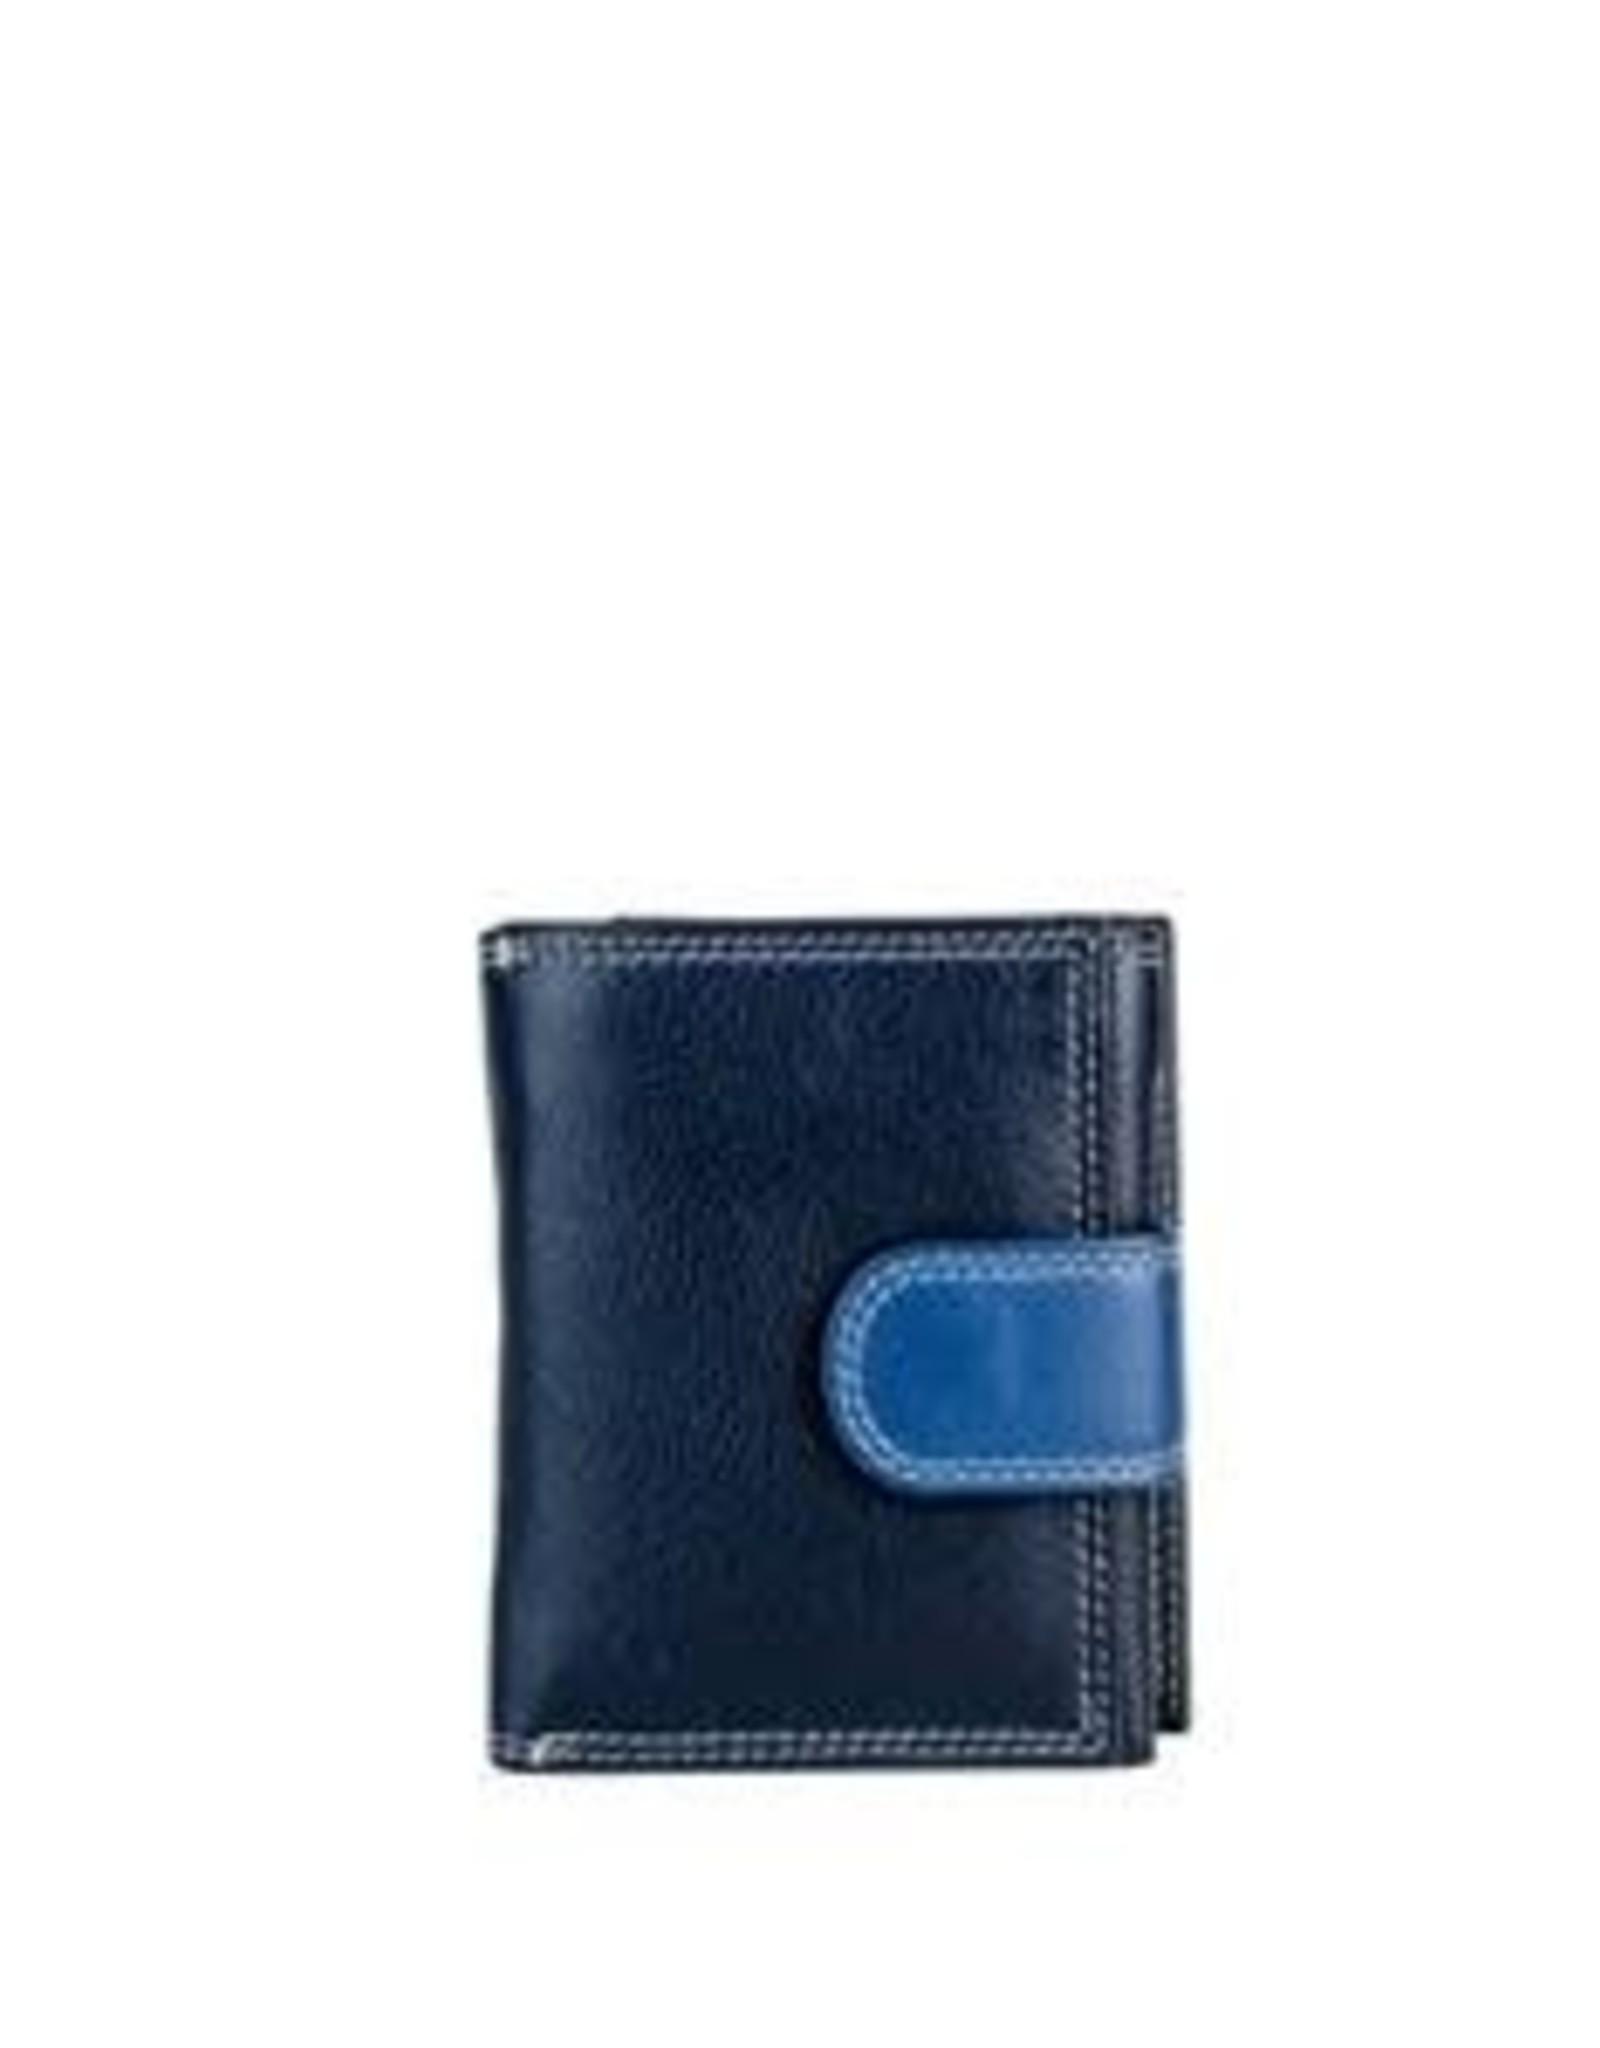 Petit portefeuille marine #2198